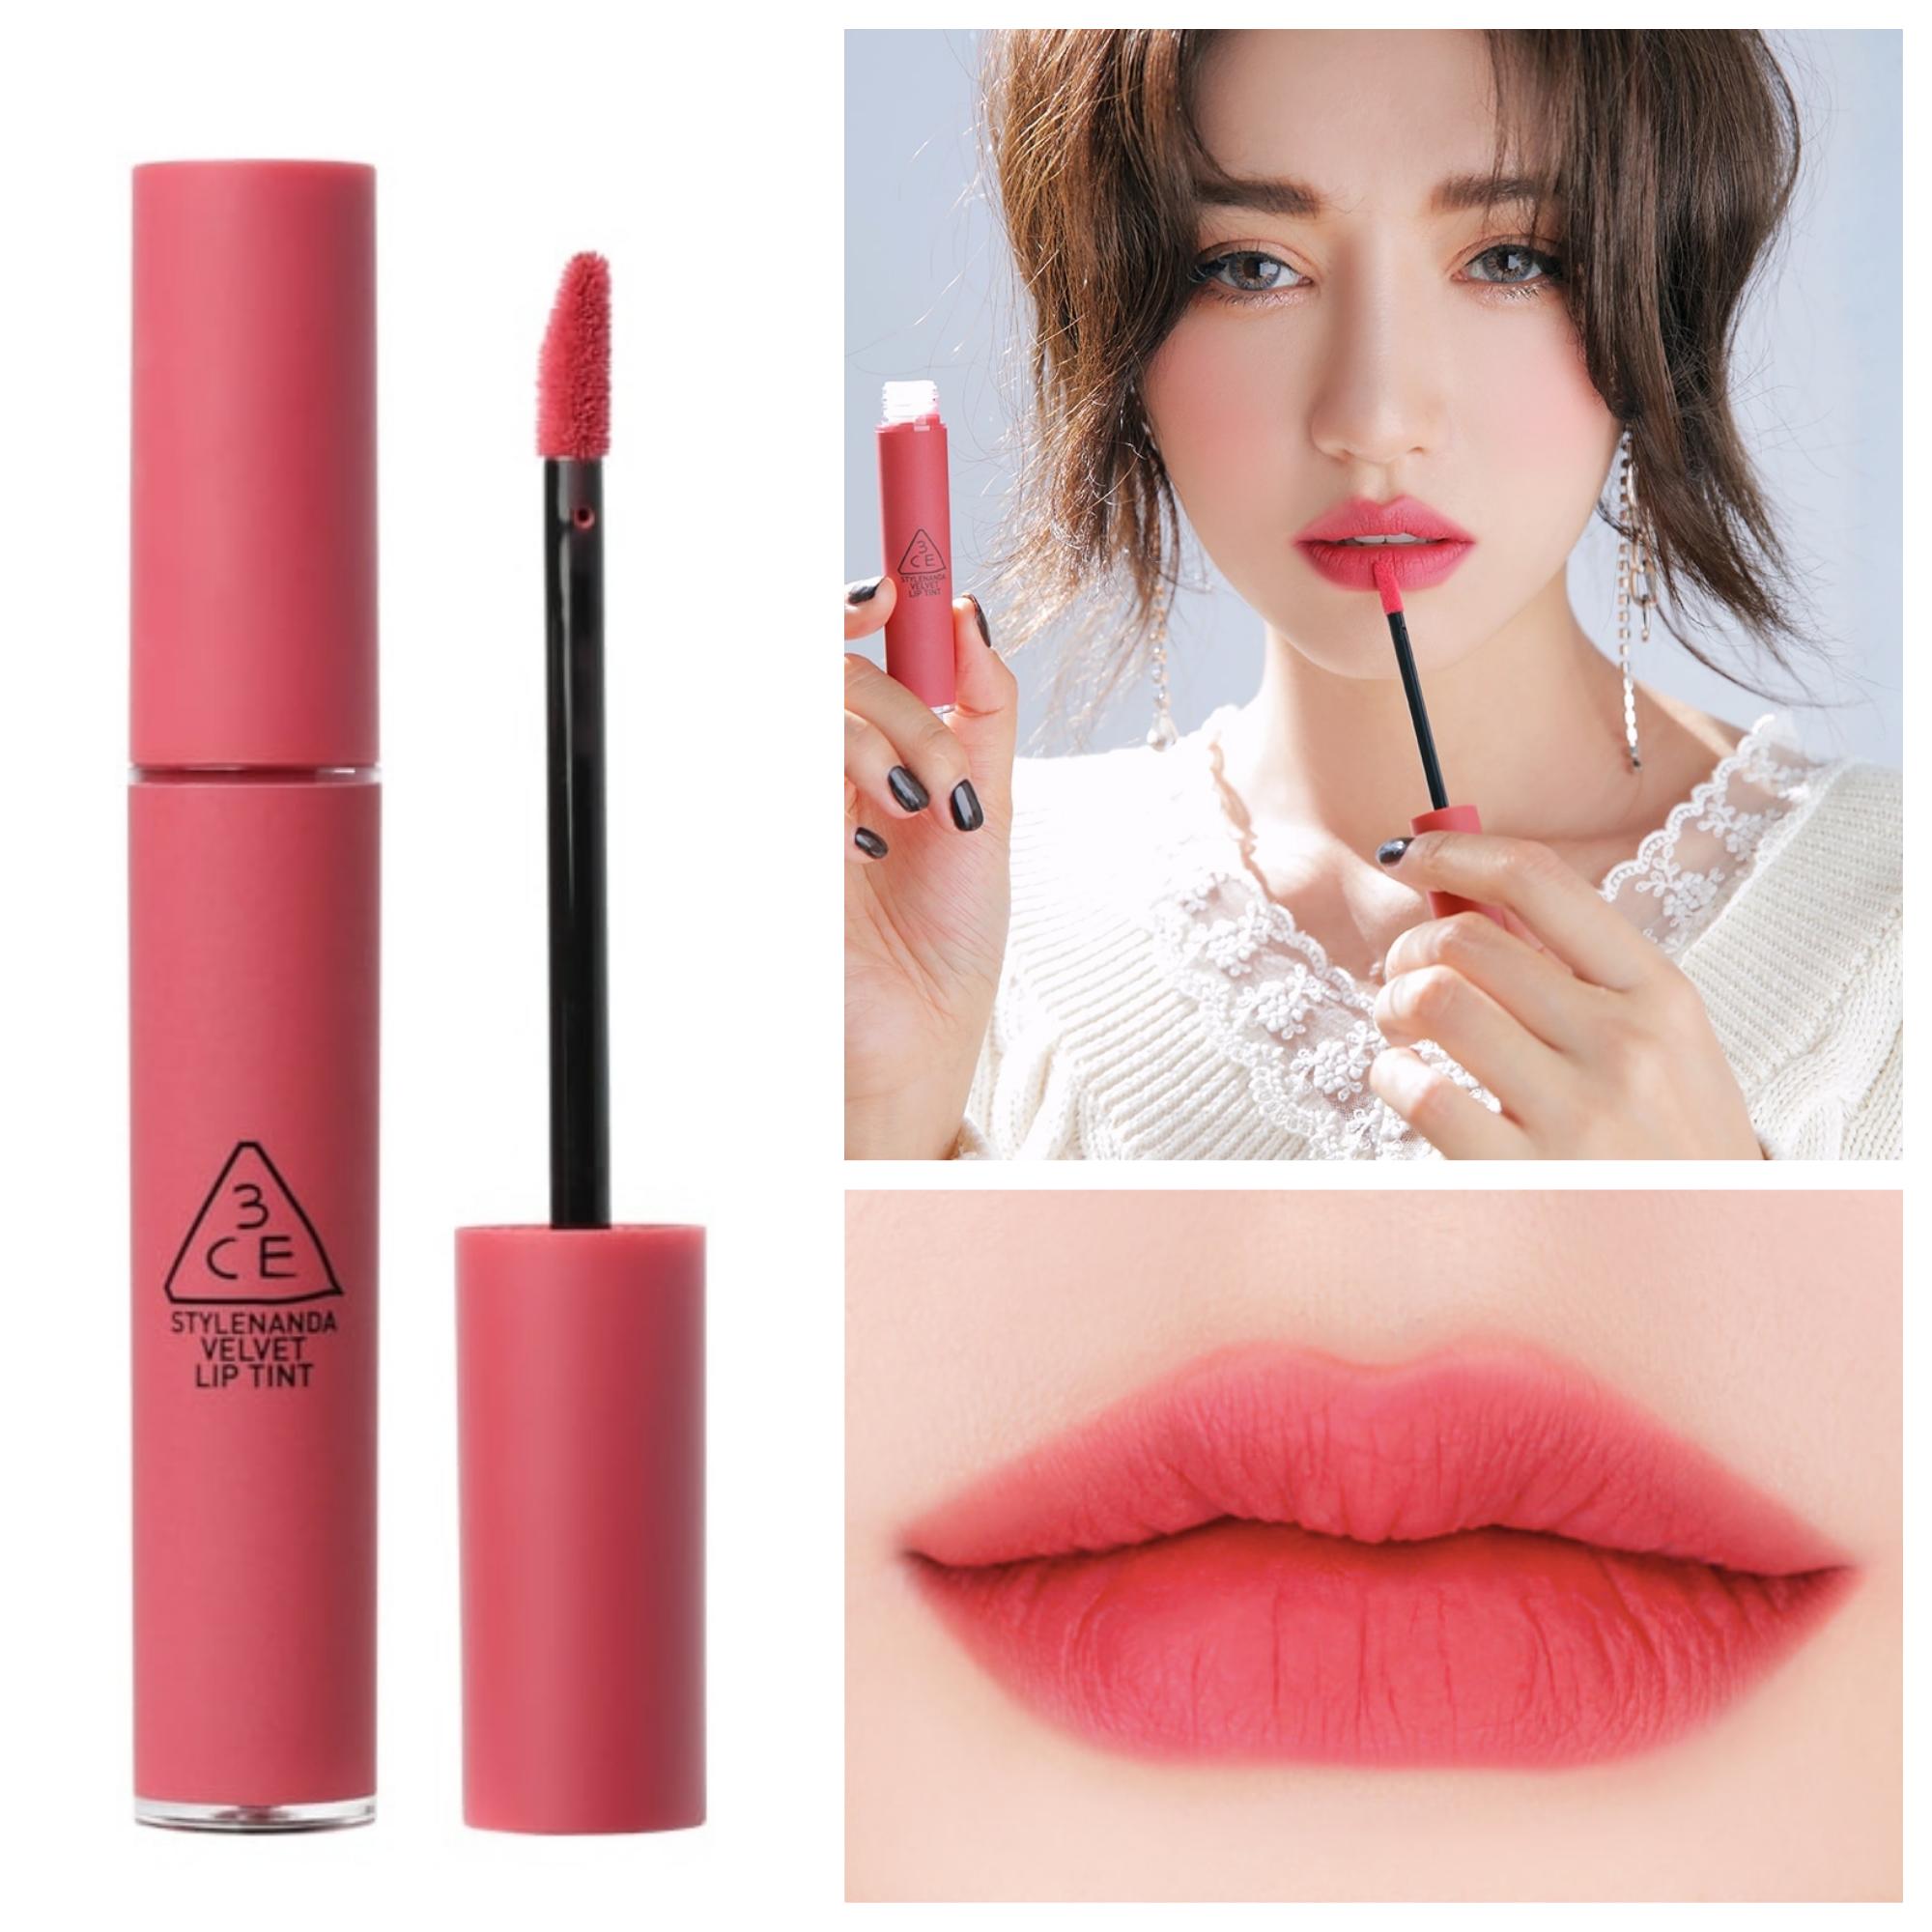 Bảng màu son 3CE Velvet Lip Tint Pink Break